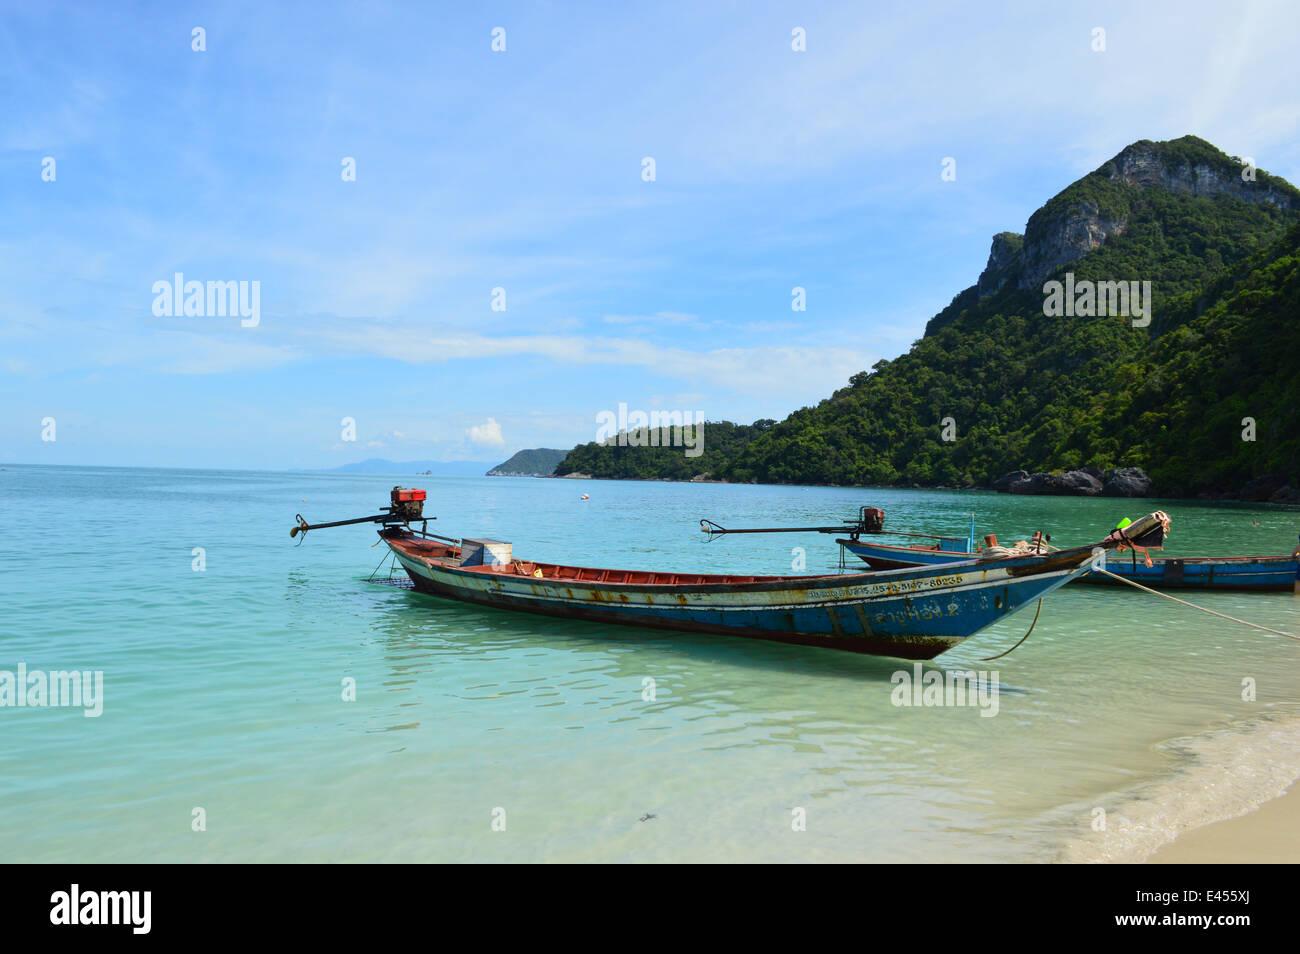 Traditionelle thai Boot, Thailand Stockbild